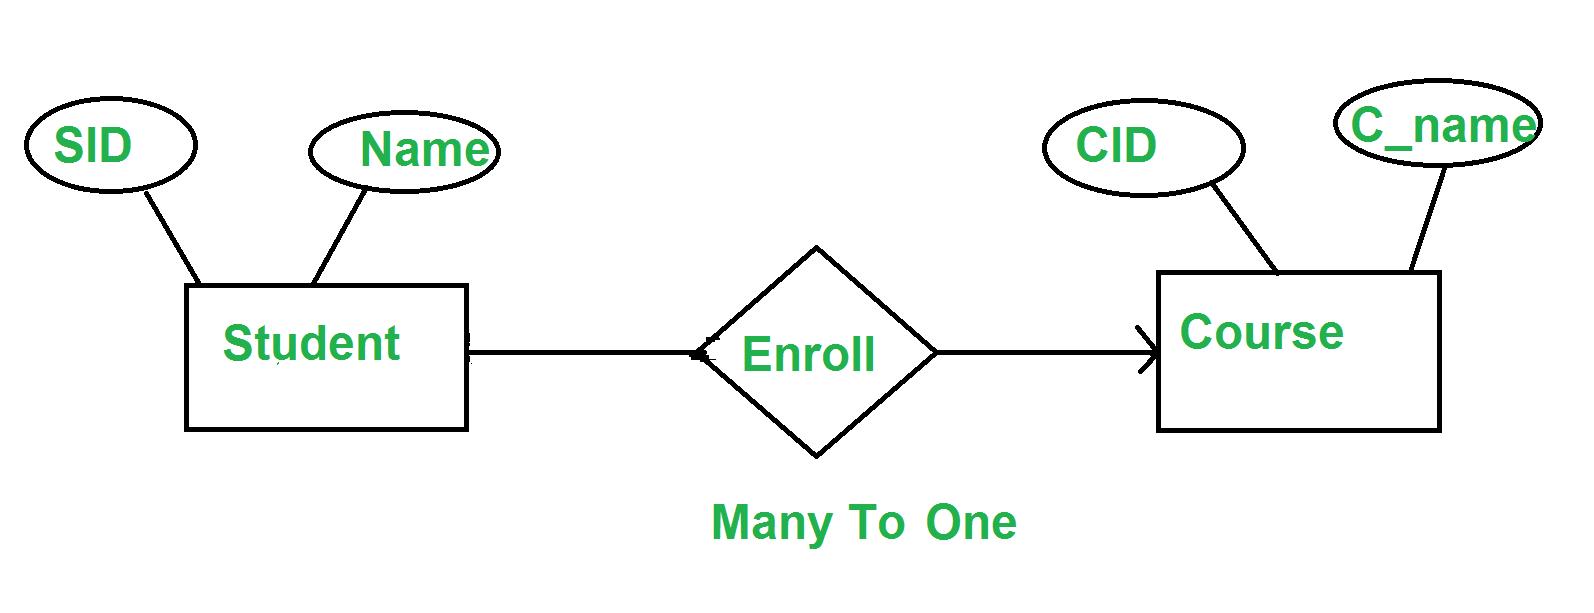 Minimization Of Er Diagram - Geeksforgeeks inside Examples Of Er Diagram In Dbms